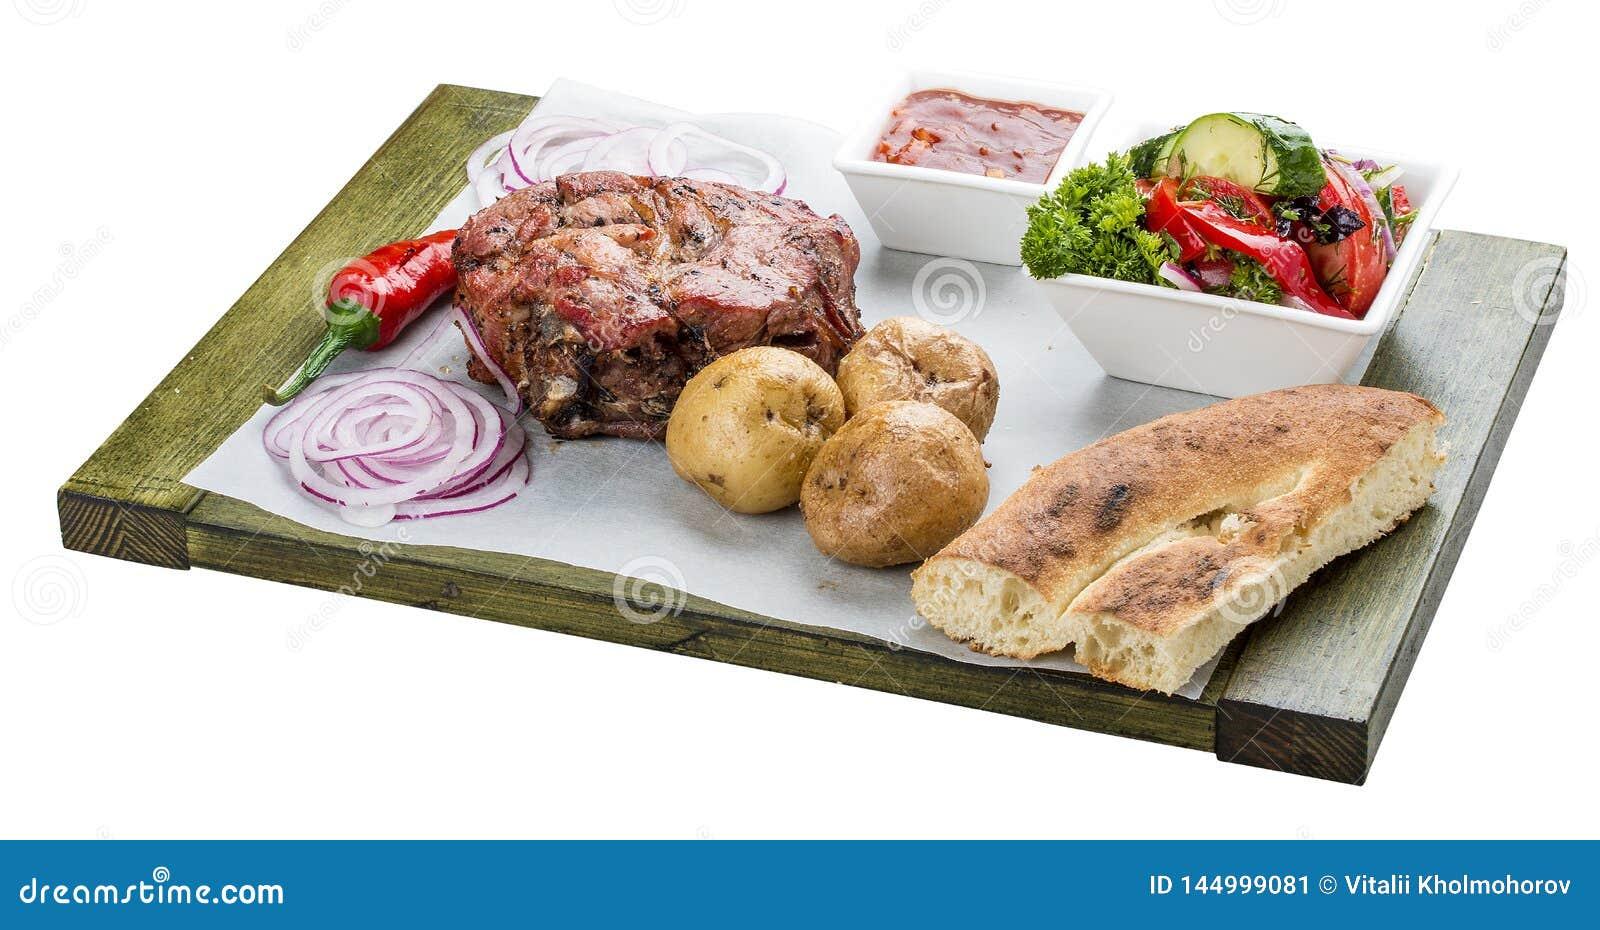 Set of pork steak, vegetable salad, potatoes and sauce. Chalagach